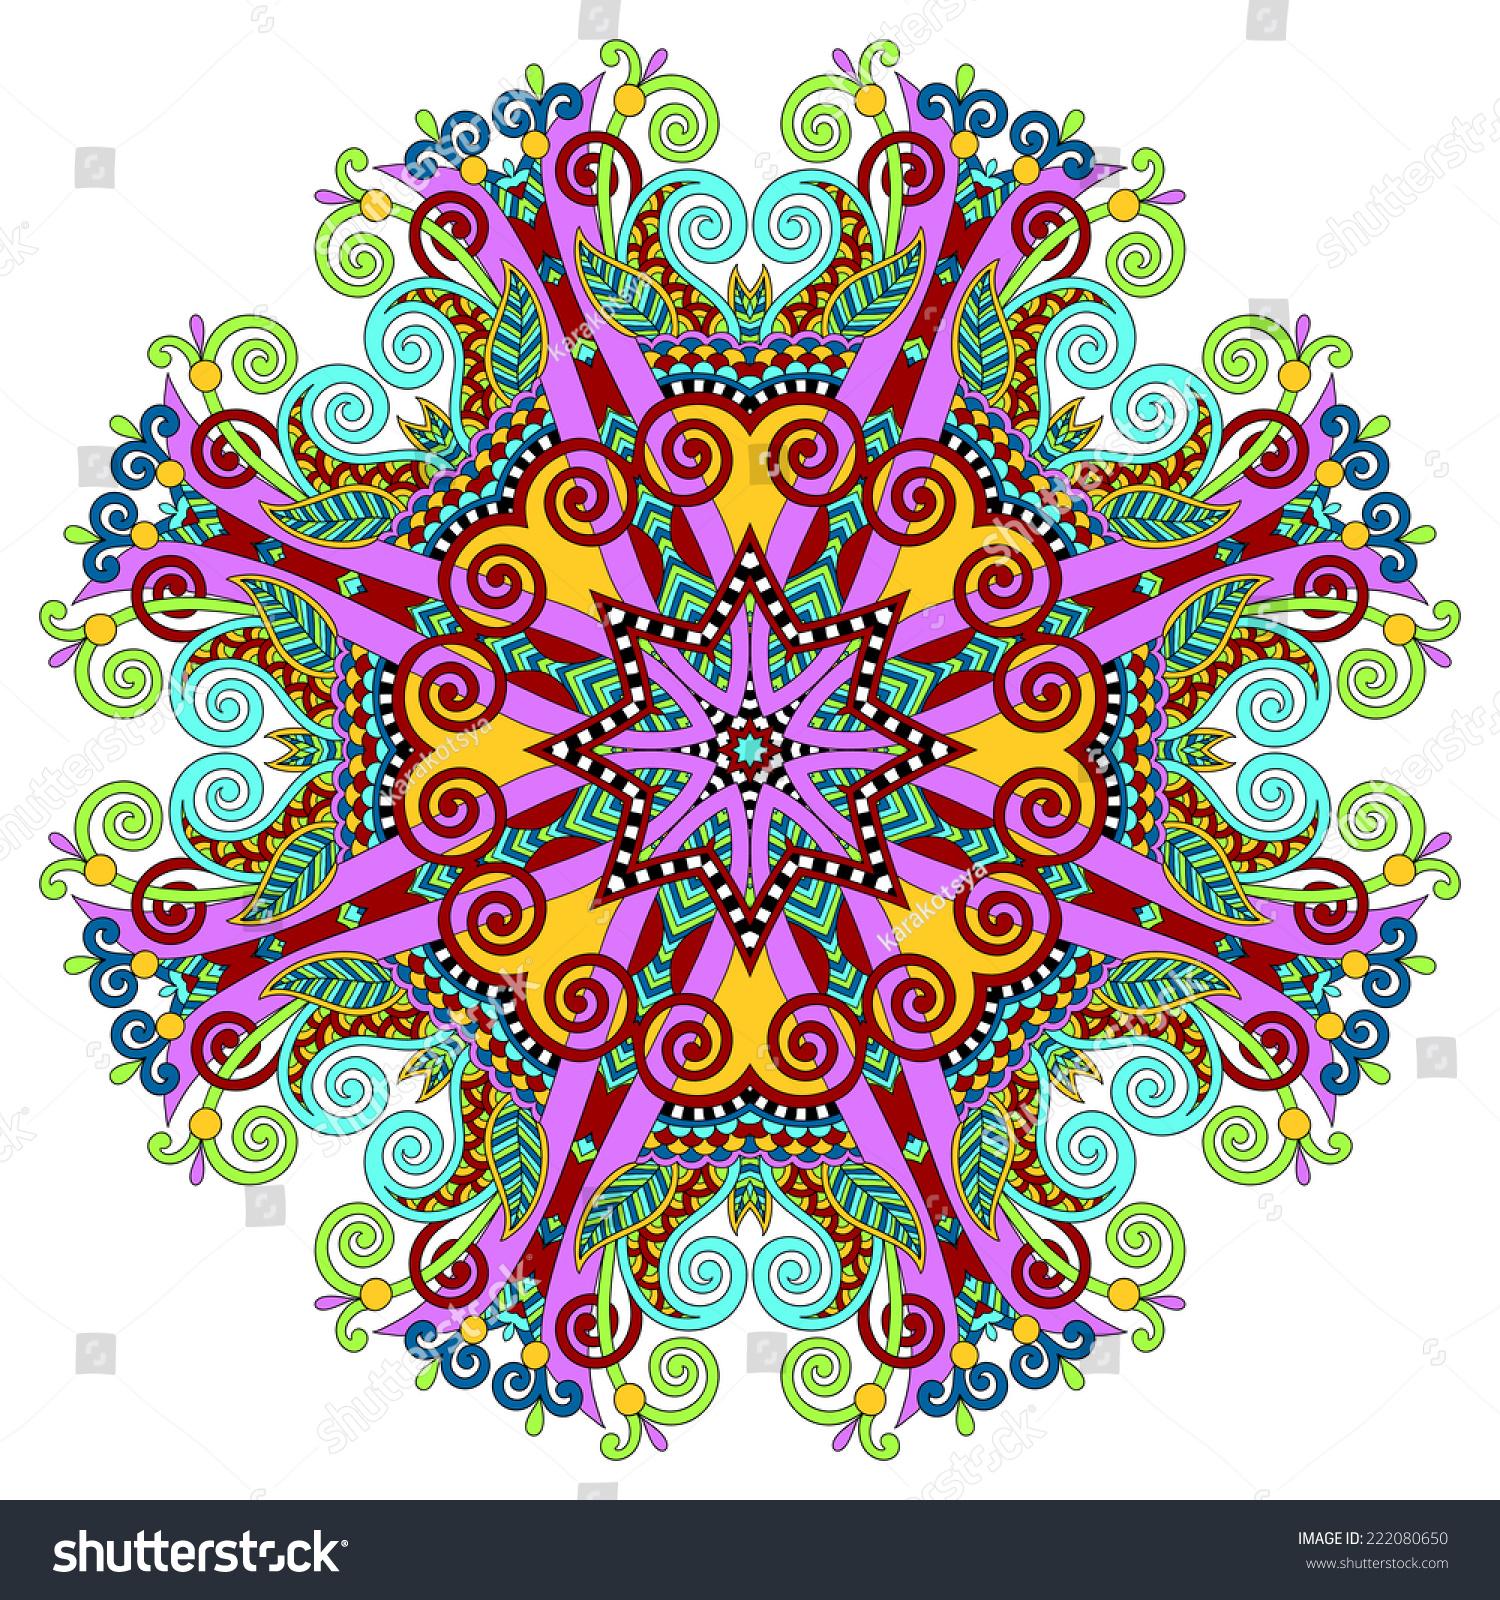 Mandala circle decorative spiritual indian symbol of lotus flower mandala circle decorative spiritual indian symbol of lotus flower round ornament pattern raster version ez canvas mightylinksfo